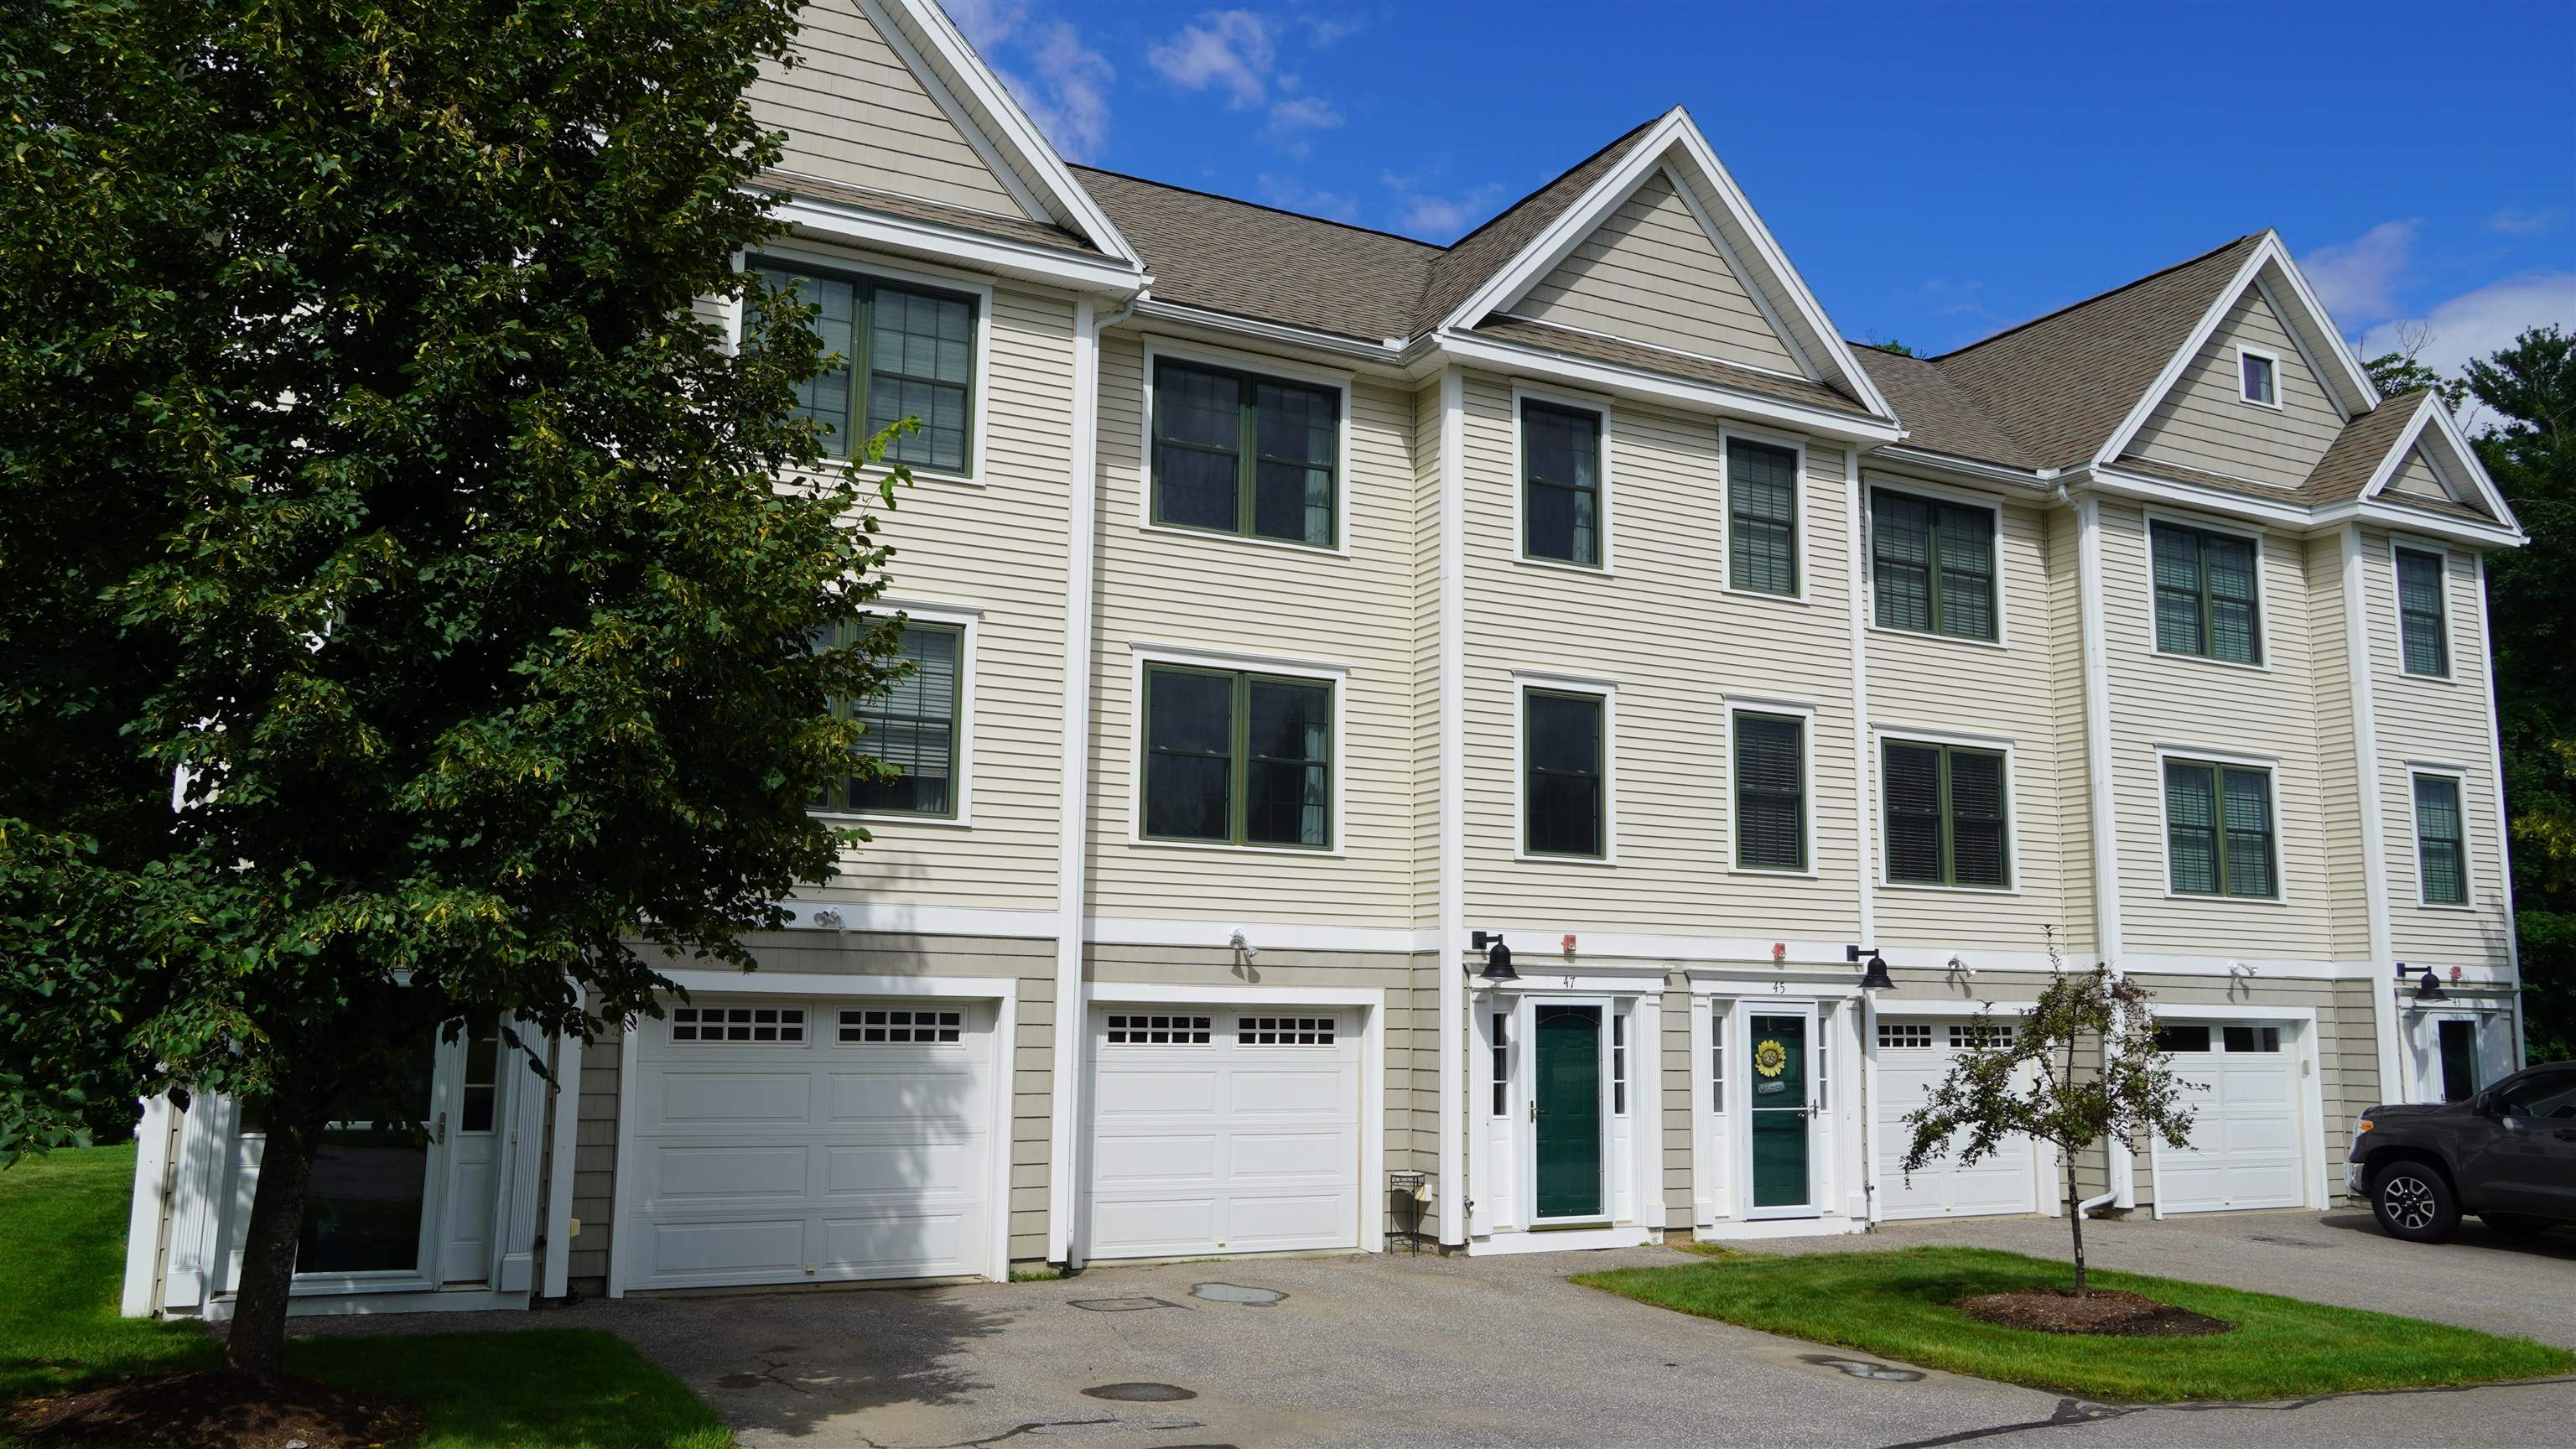 47 Village Drive, Meredith, NH 03253